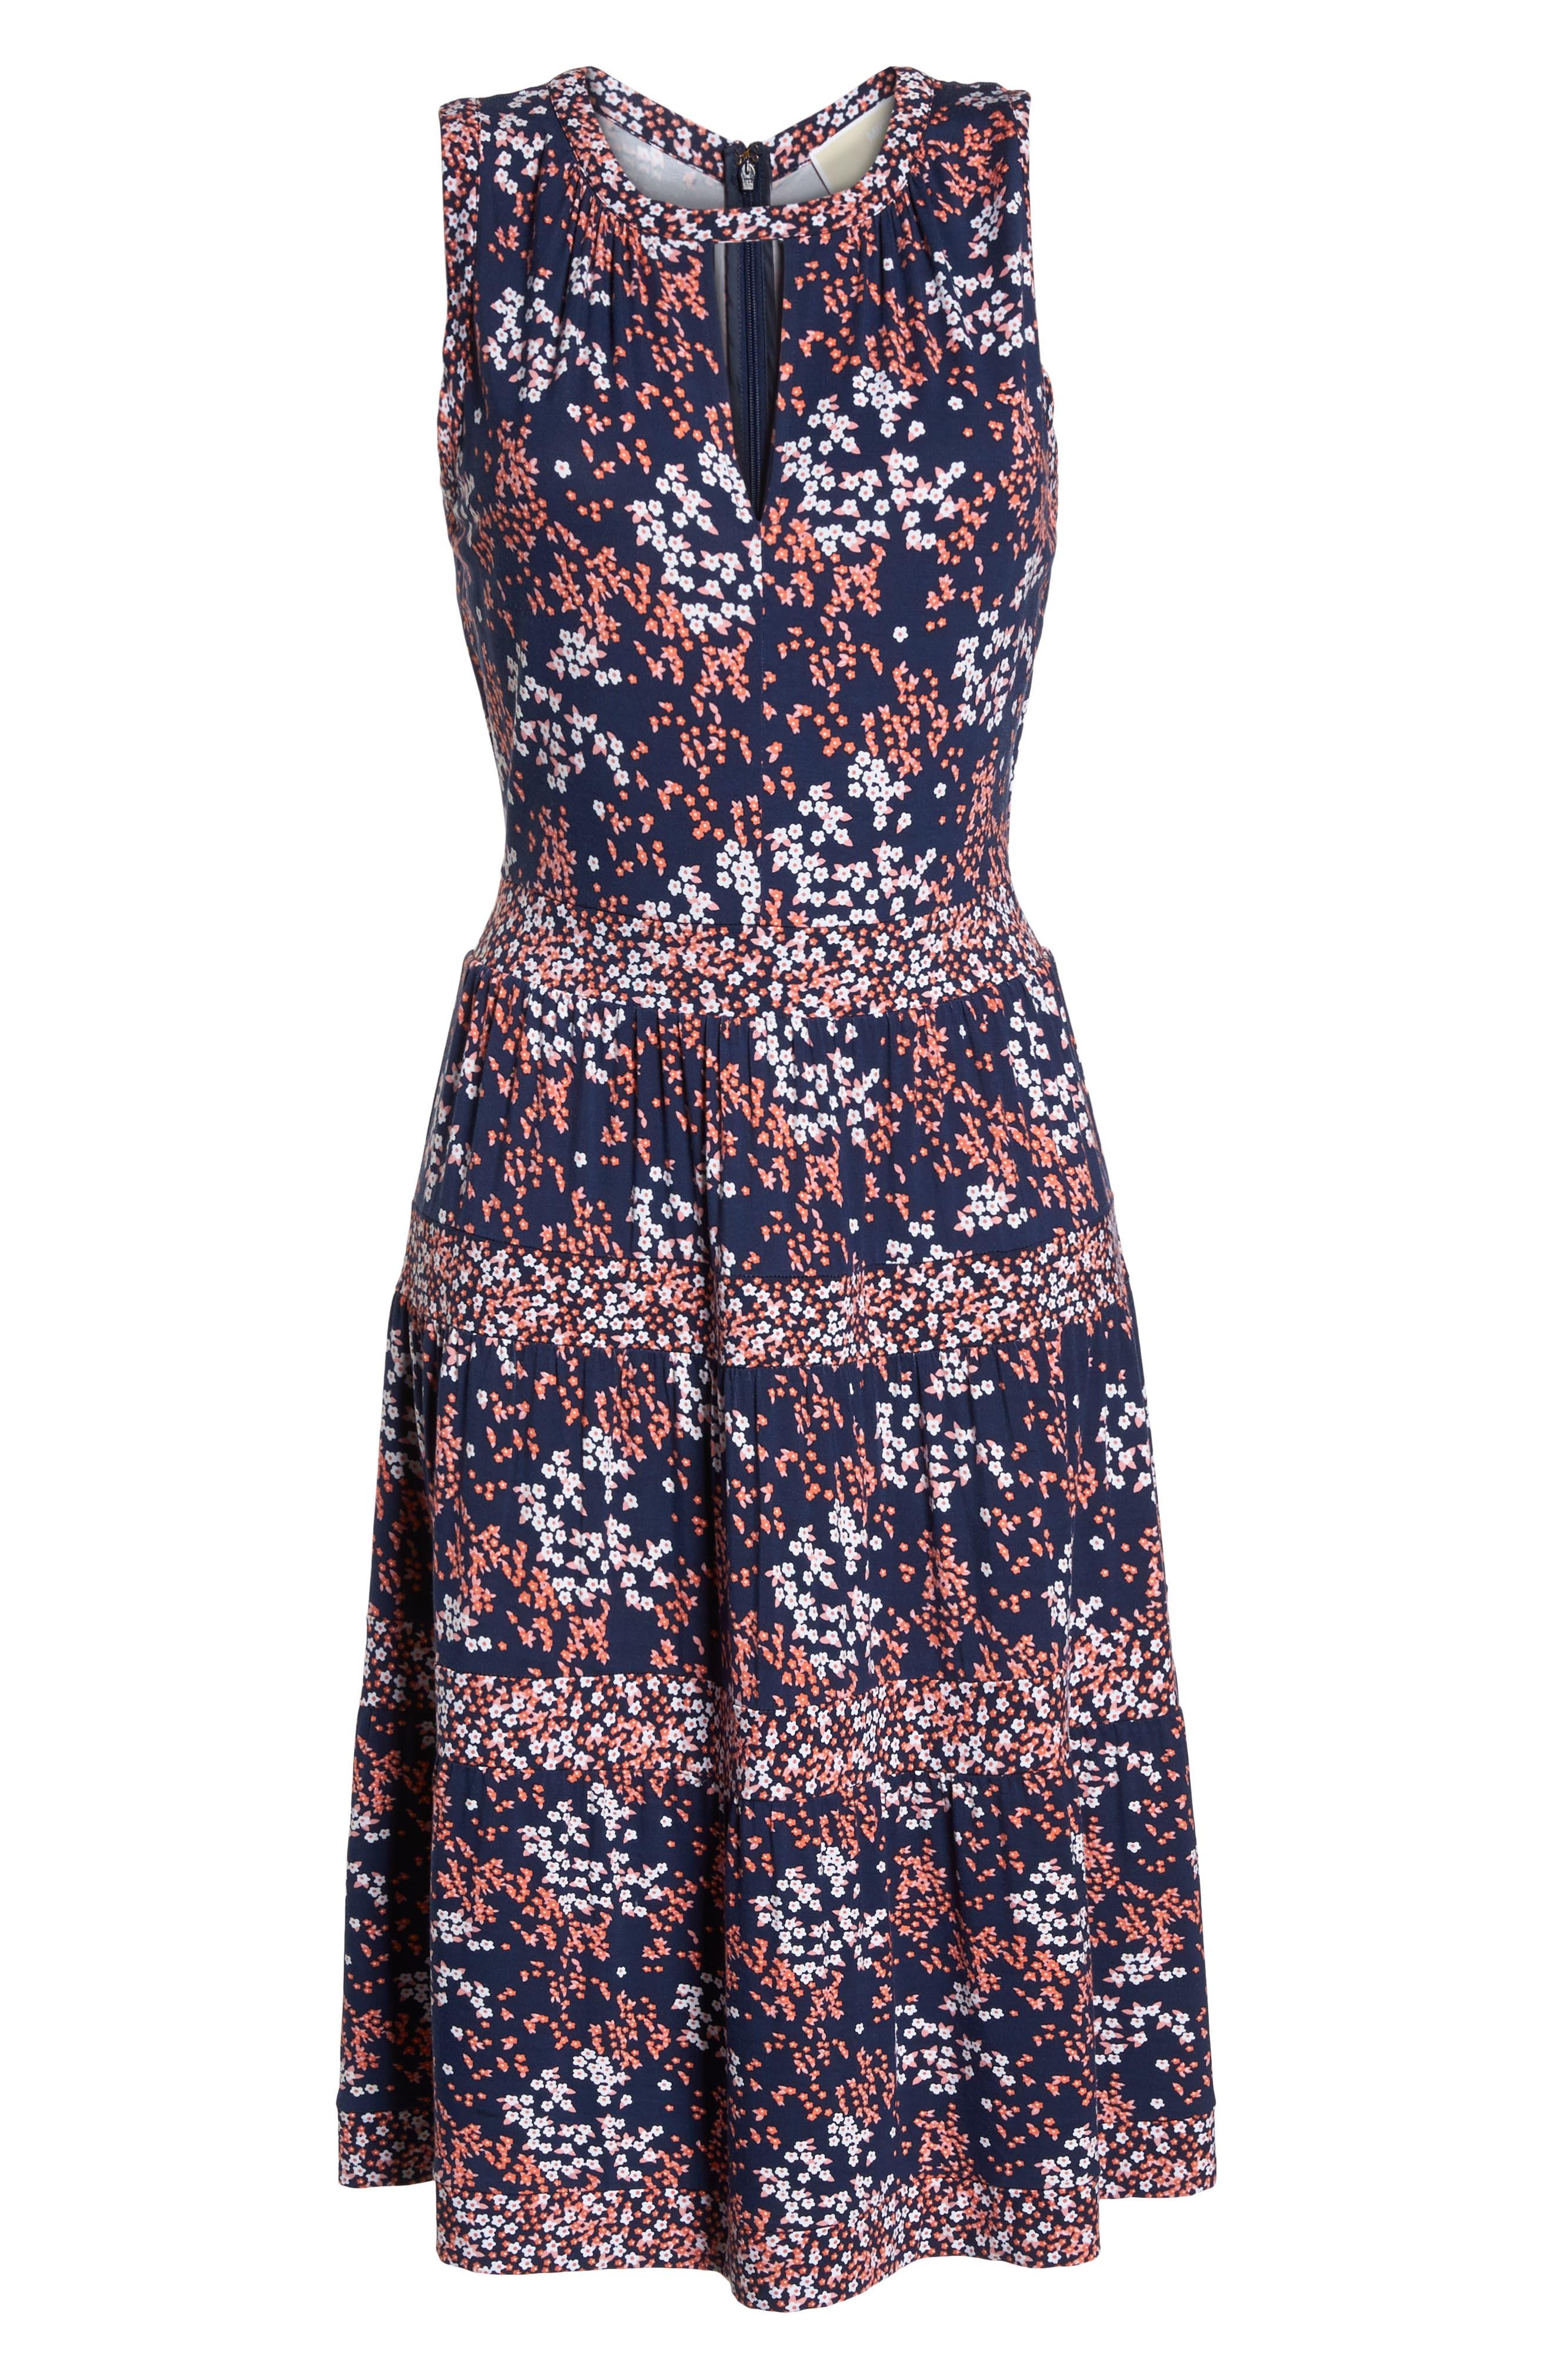 Blooms Border Tiered Dress,                             Alternate thumbnail 7, color,                             True Navy/ Bright Blush